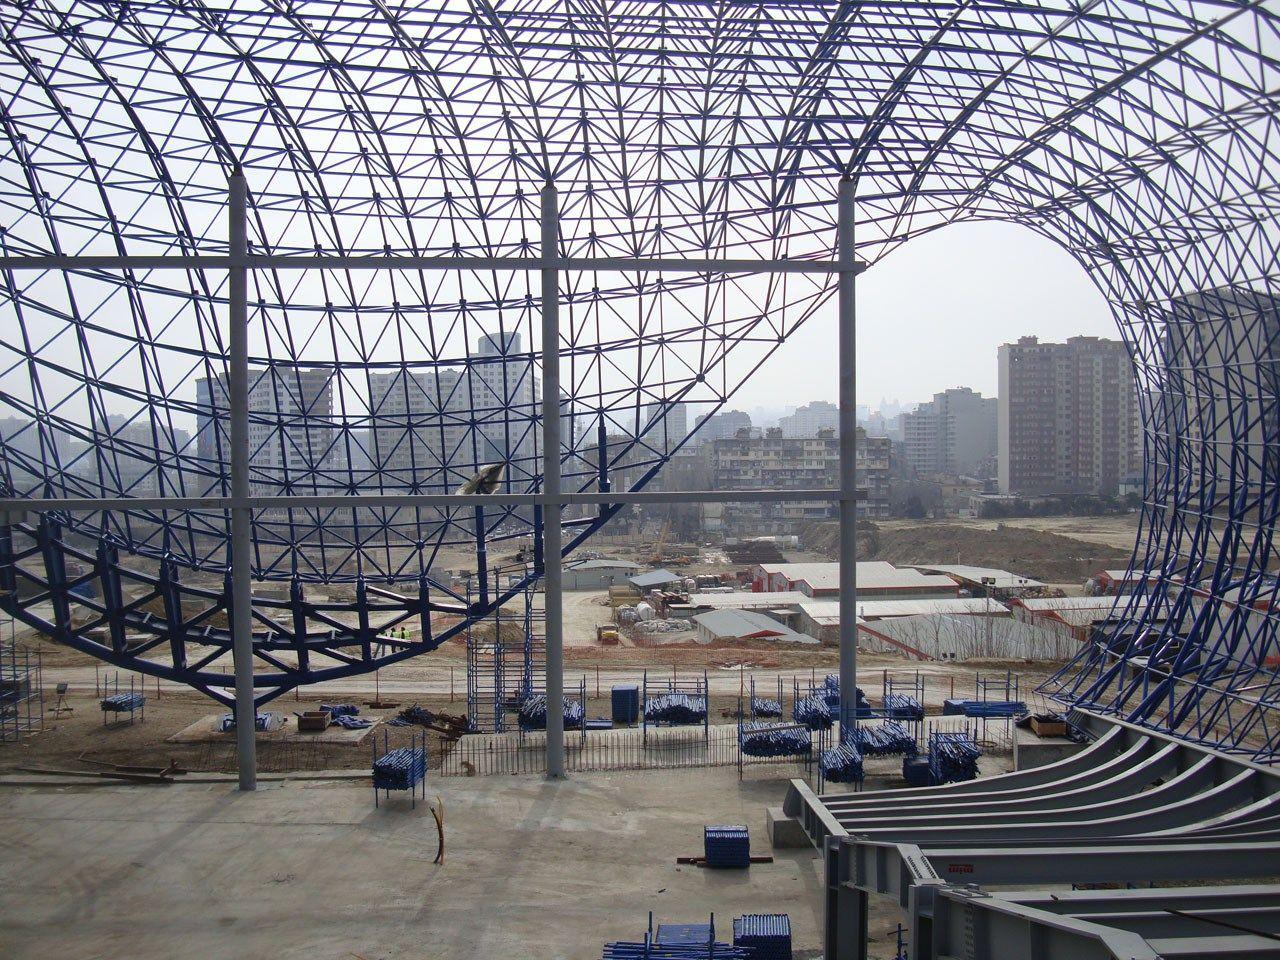 Top Stainless Steel Space Frame Companies In India Zaha Hadid Zaha Hadid Design Zaha